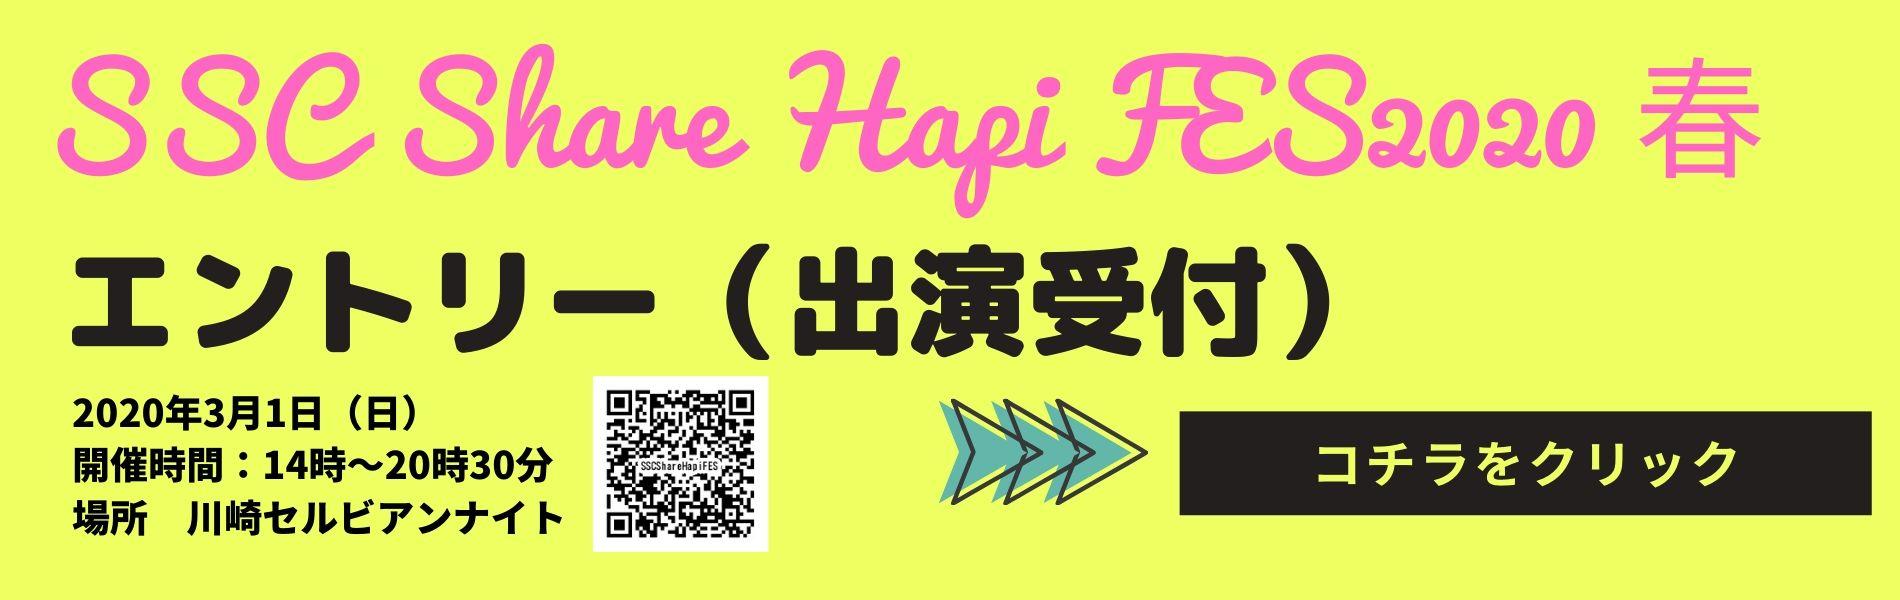 SSC Share Hapi FES2020 春